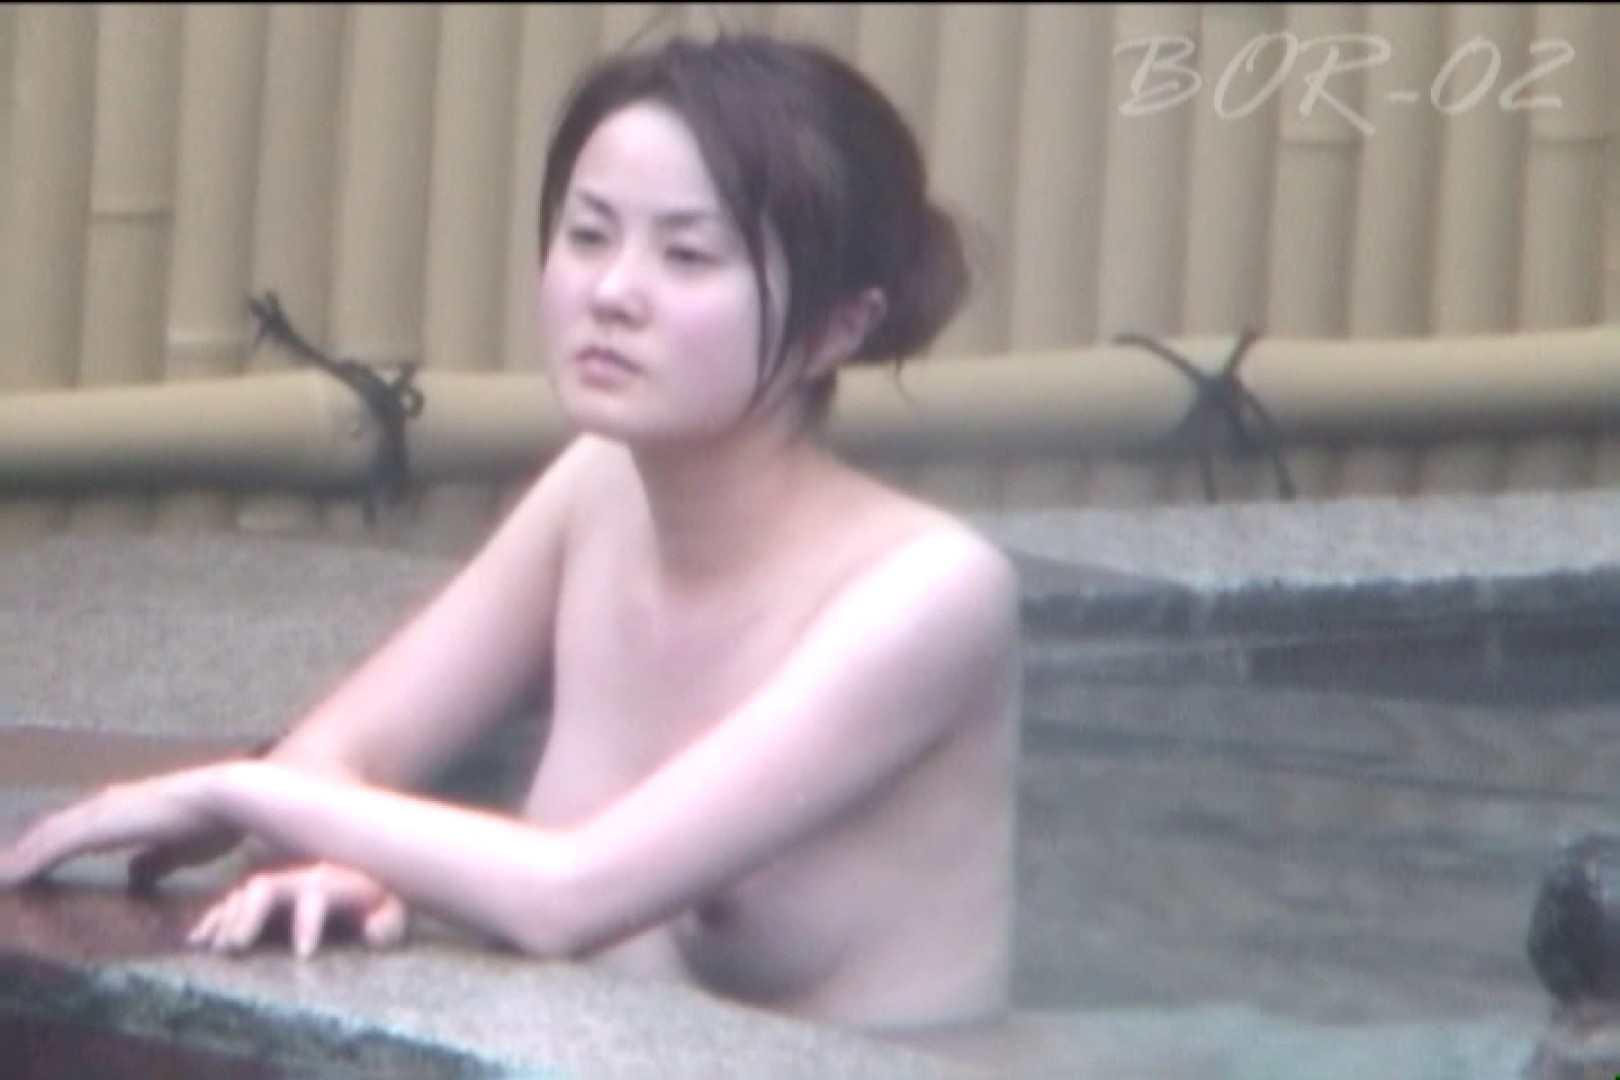 Aquaな露天風呂Vol.474 盗撮  31連発 12